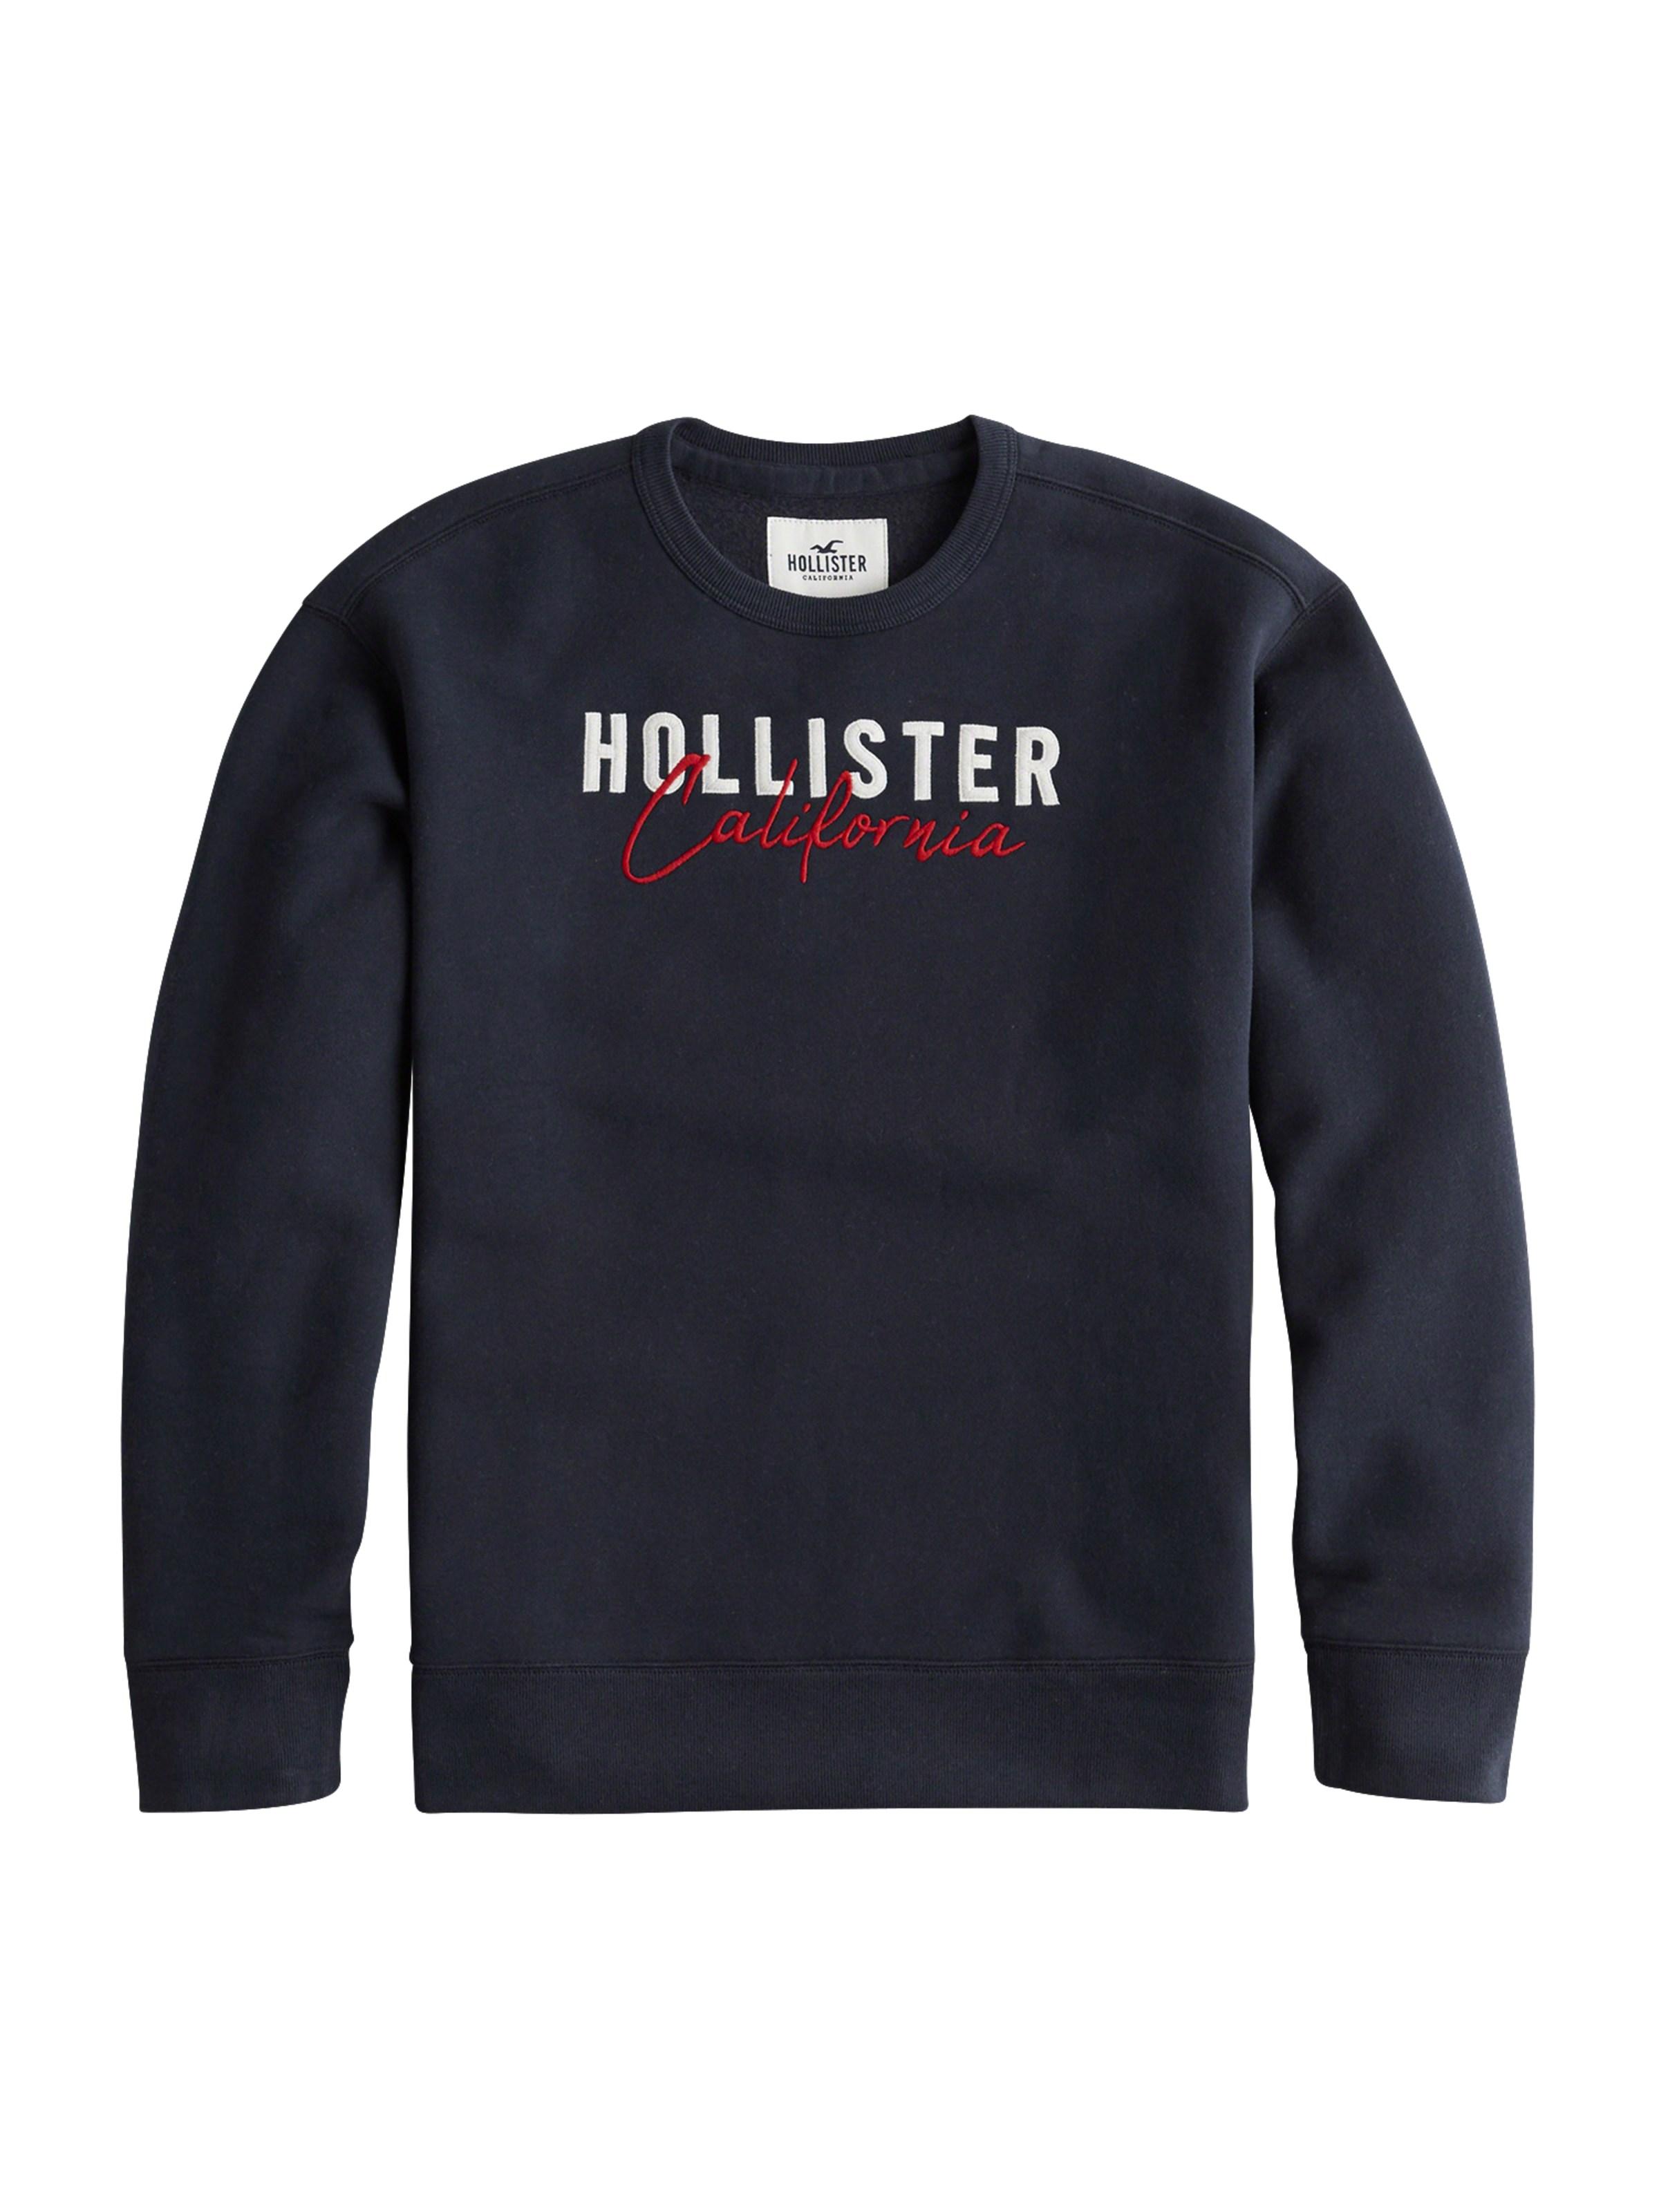 HOLLISTER Mikina  HOLLISTER SCRIPT CREW  námořnická modř   bílá ... f1d26141128